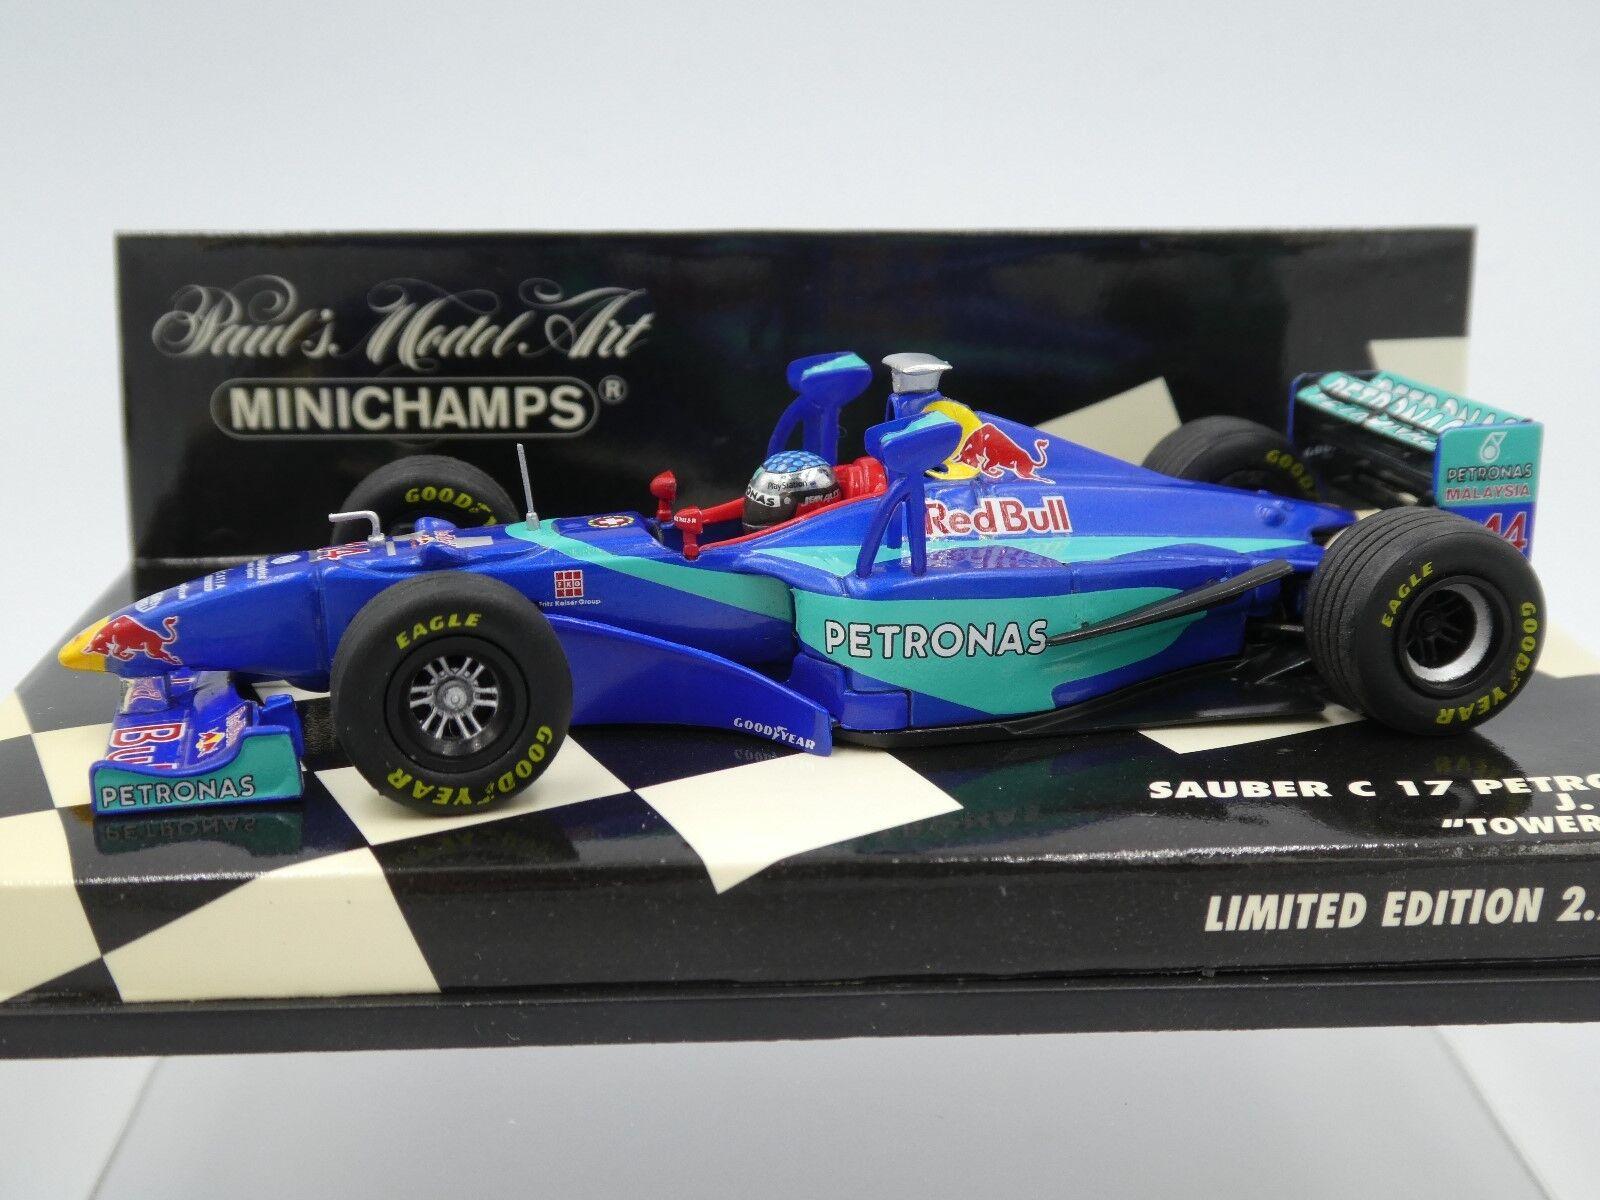 Minichamps 1 43 JEAN ALESI SAUBER PETRONAS C17  TOWER WING  F1 1998